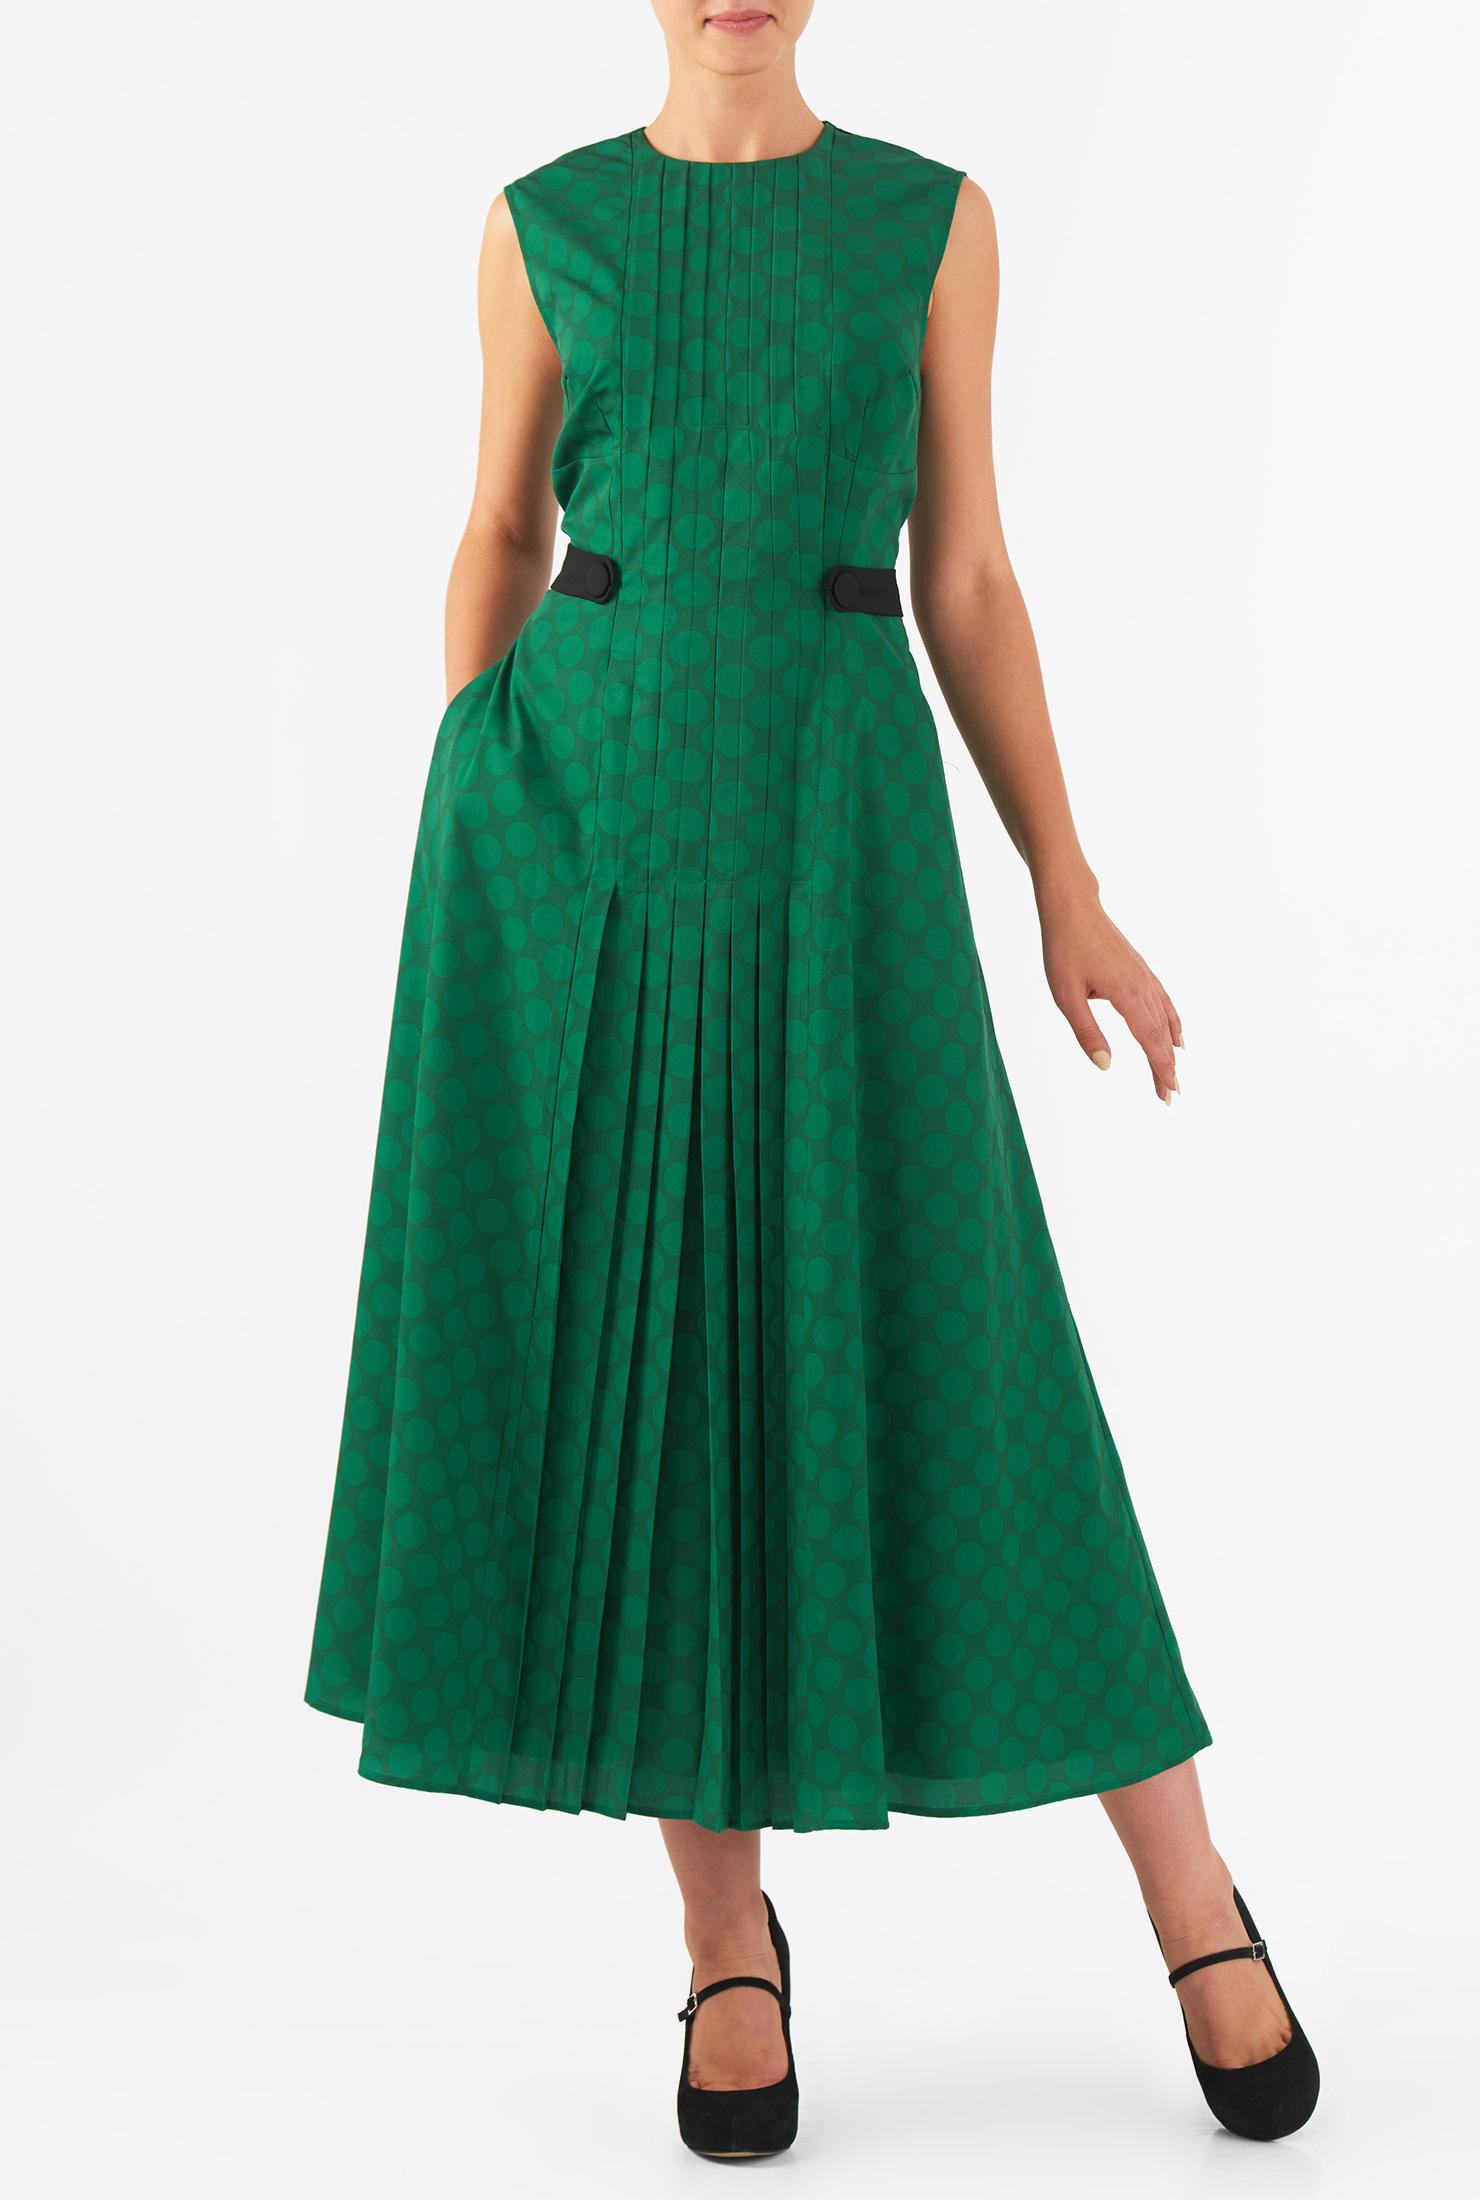 Eshakti Womens Pleat Front Polka Dot Print Crepe Maxi Dress